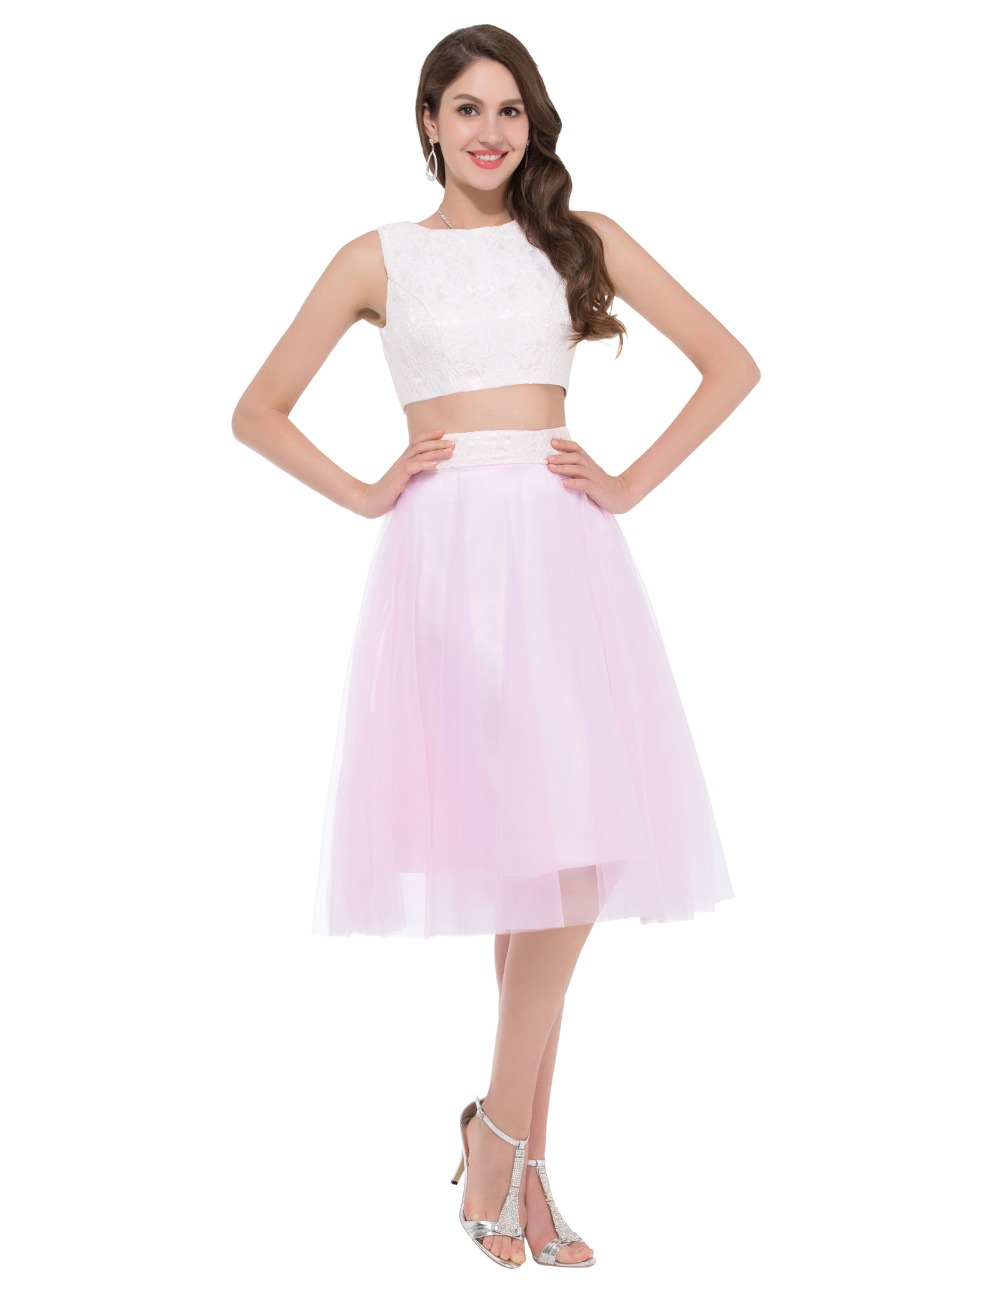 Poofy Short Dresses